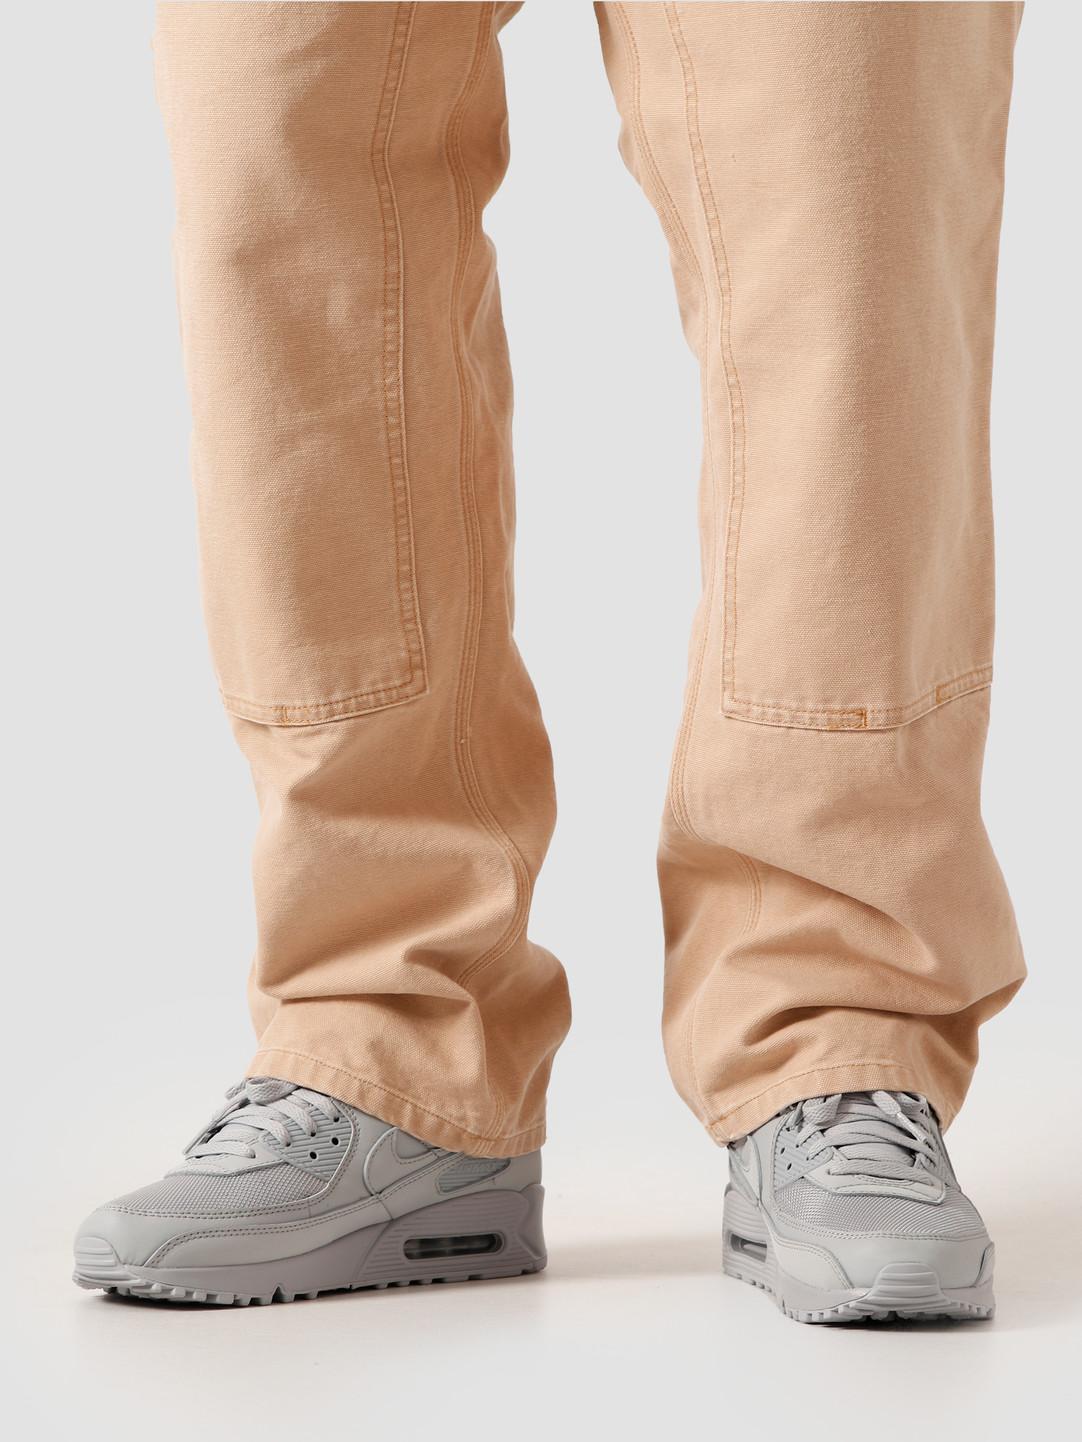 Carhartt WIP Carhartt WIP Double Knee Pant Dusty H Brown I029196-07E3K